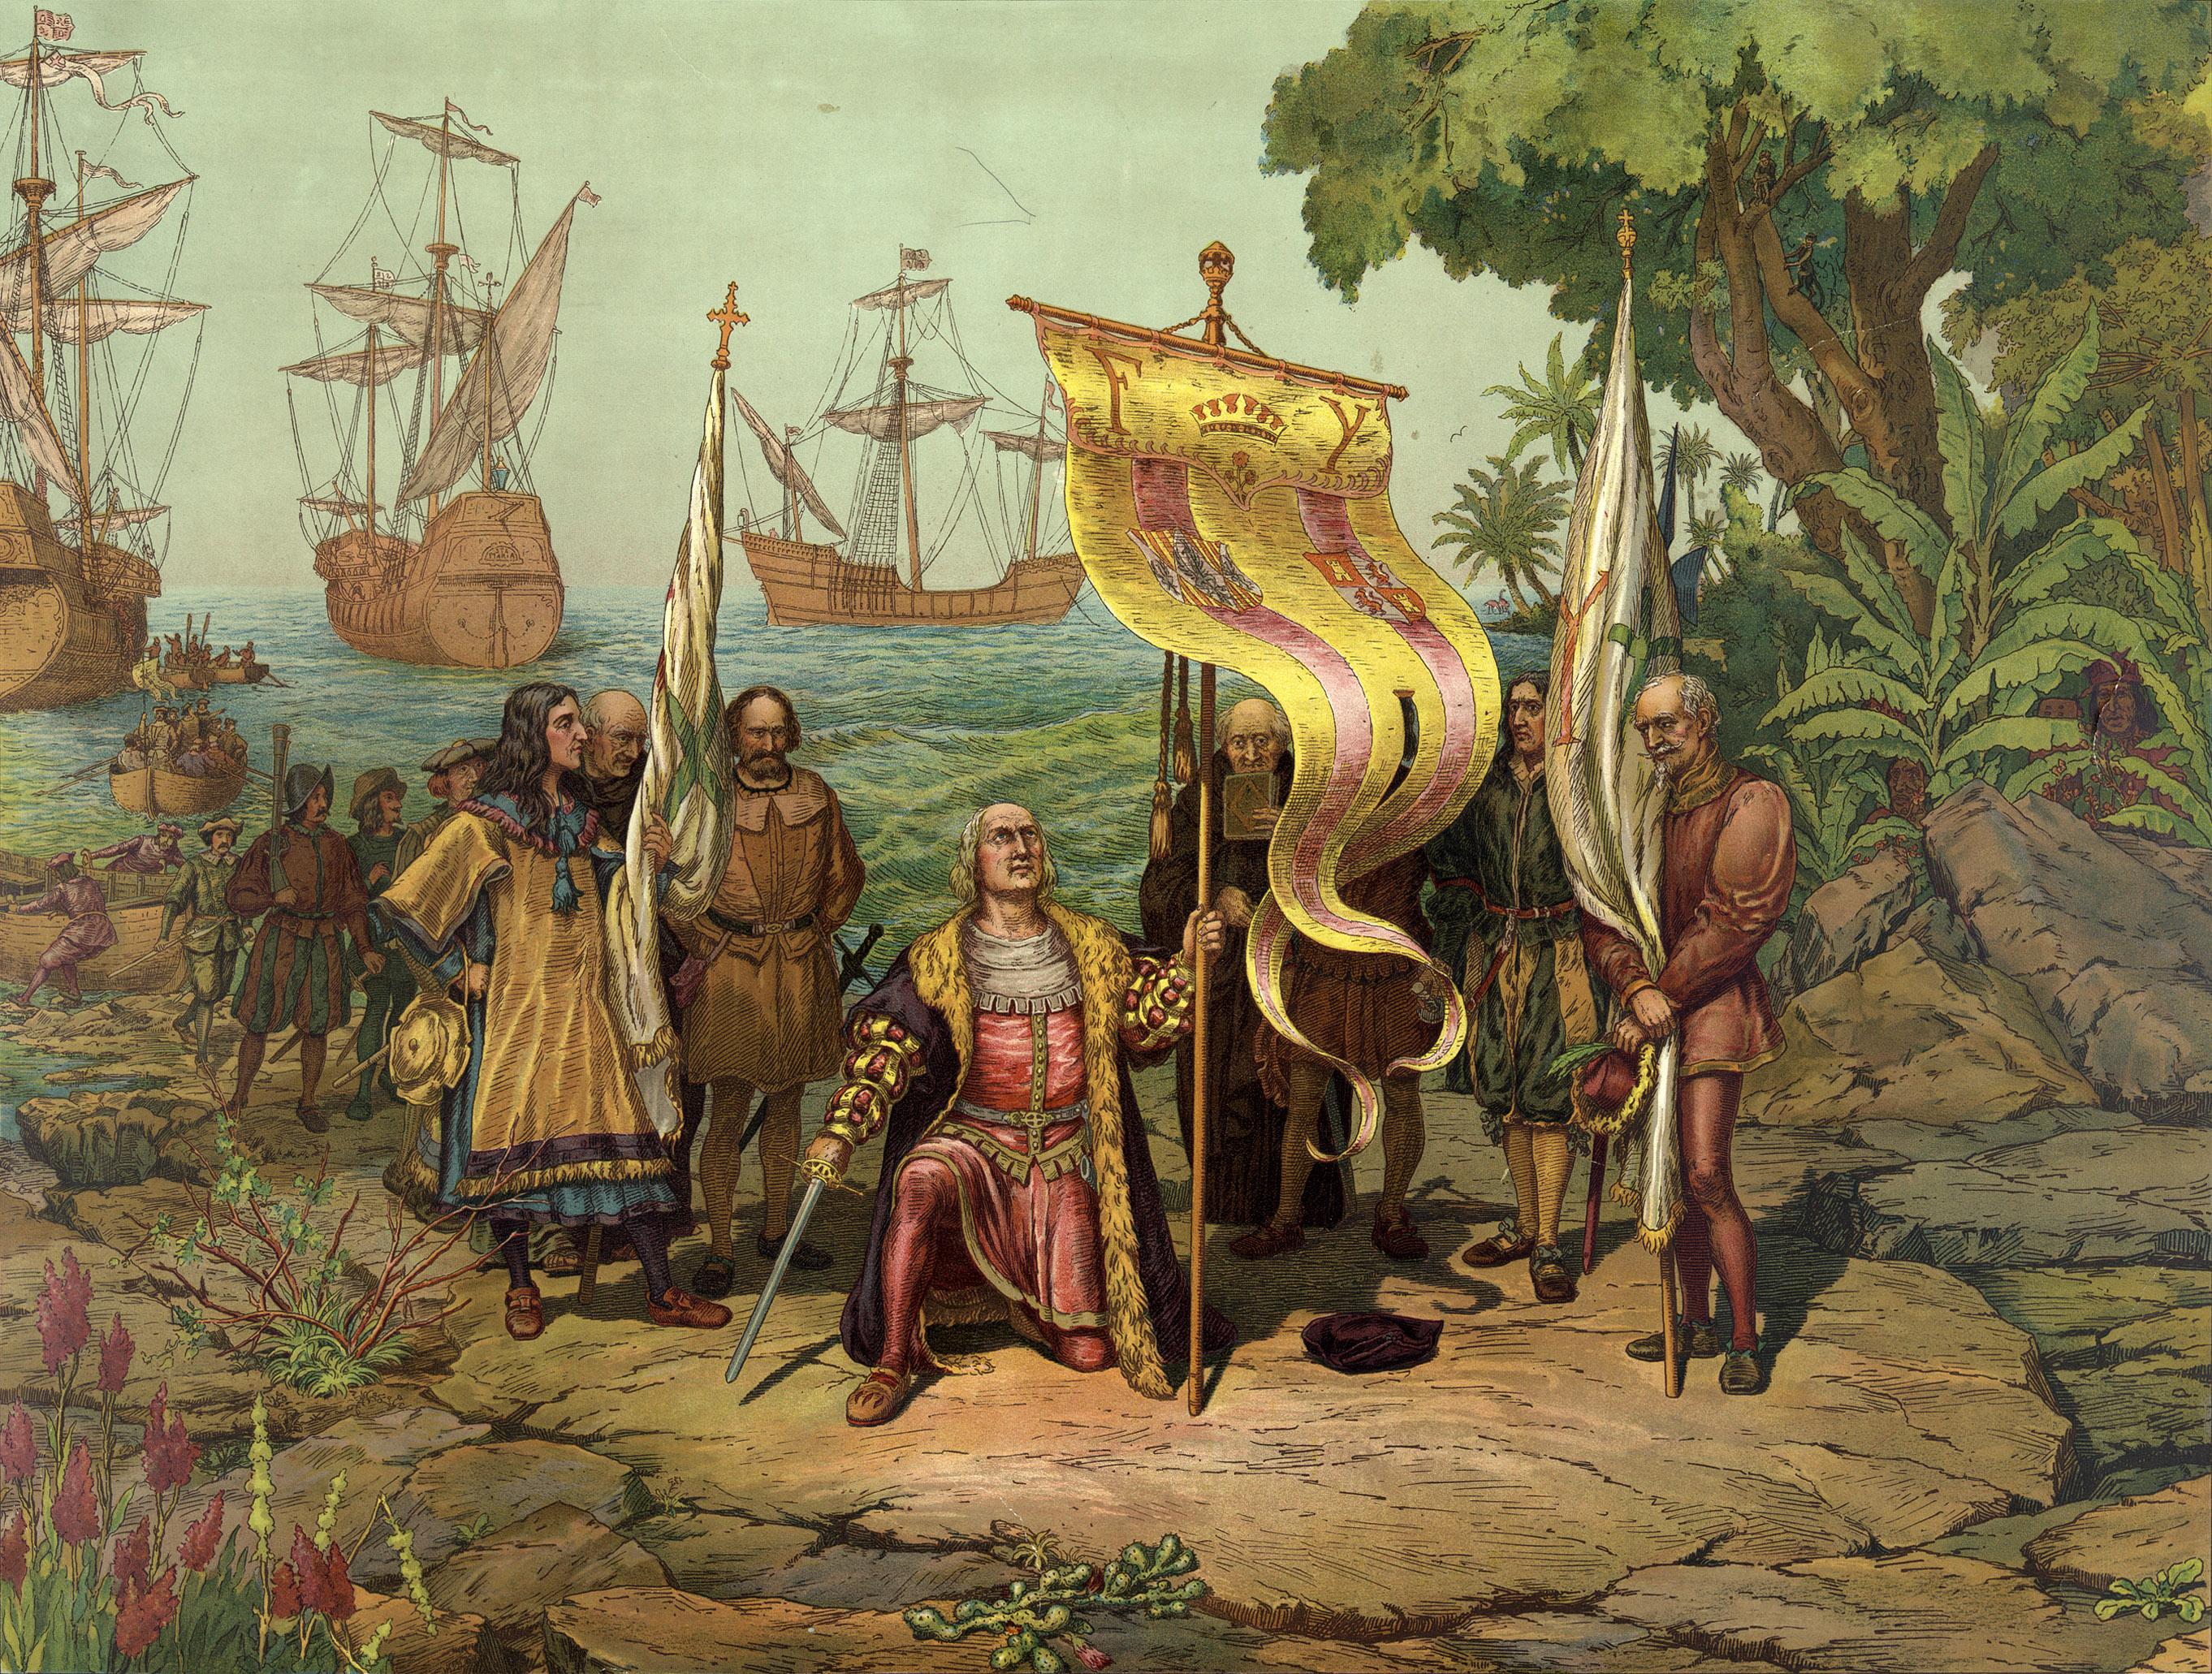 Христофор Колумб - открытие Америки